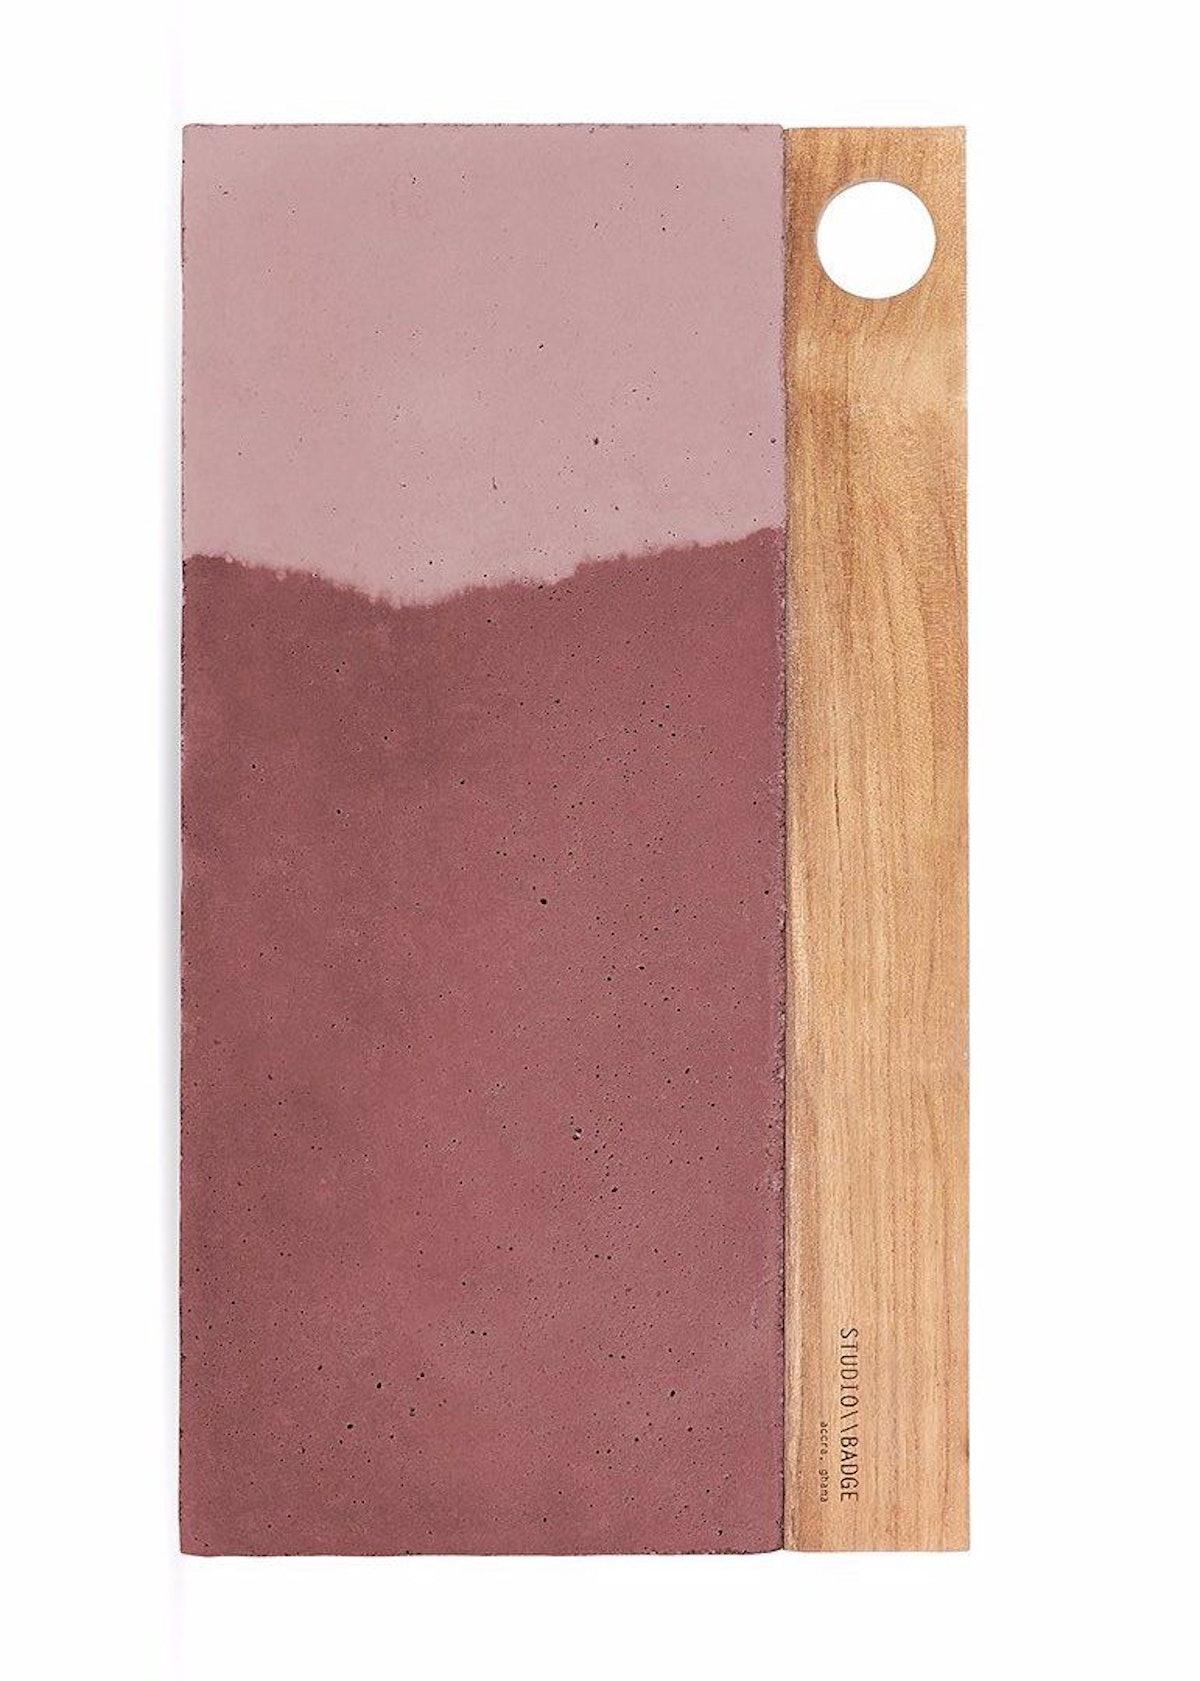 Aitch Concrete Platter in Dusty Rose Tones: image 1